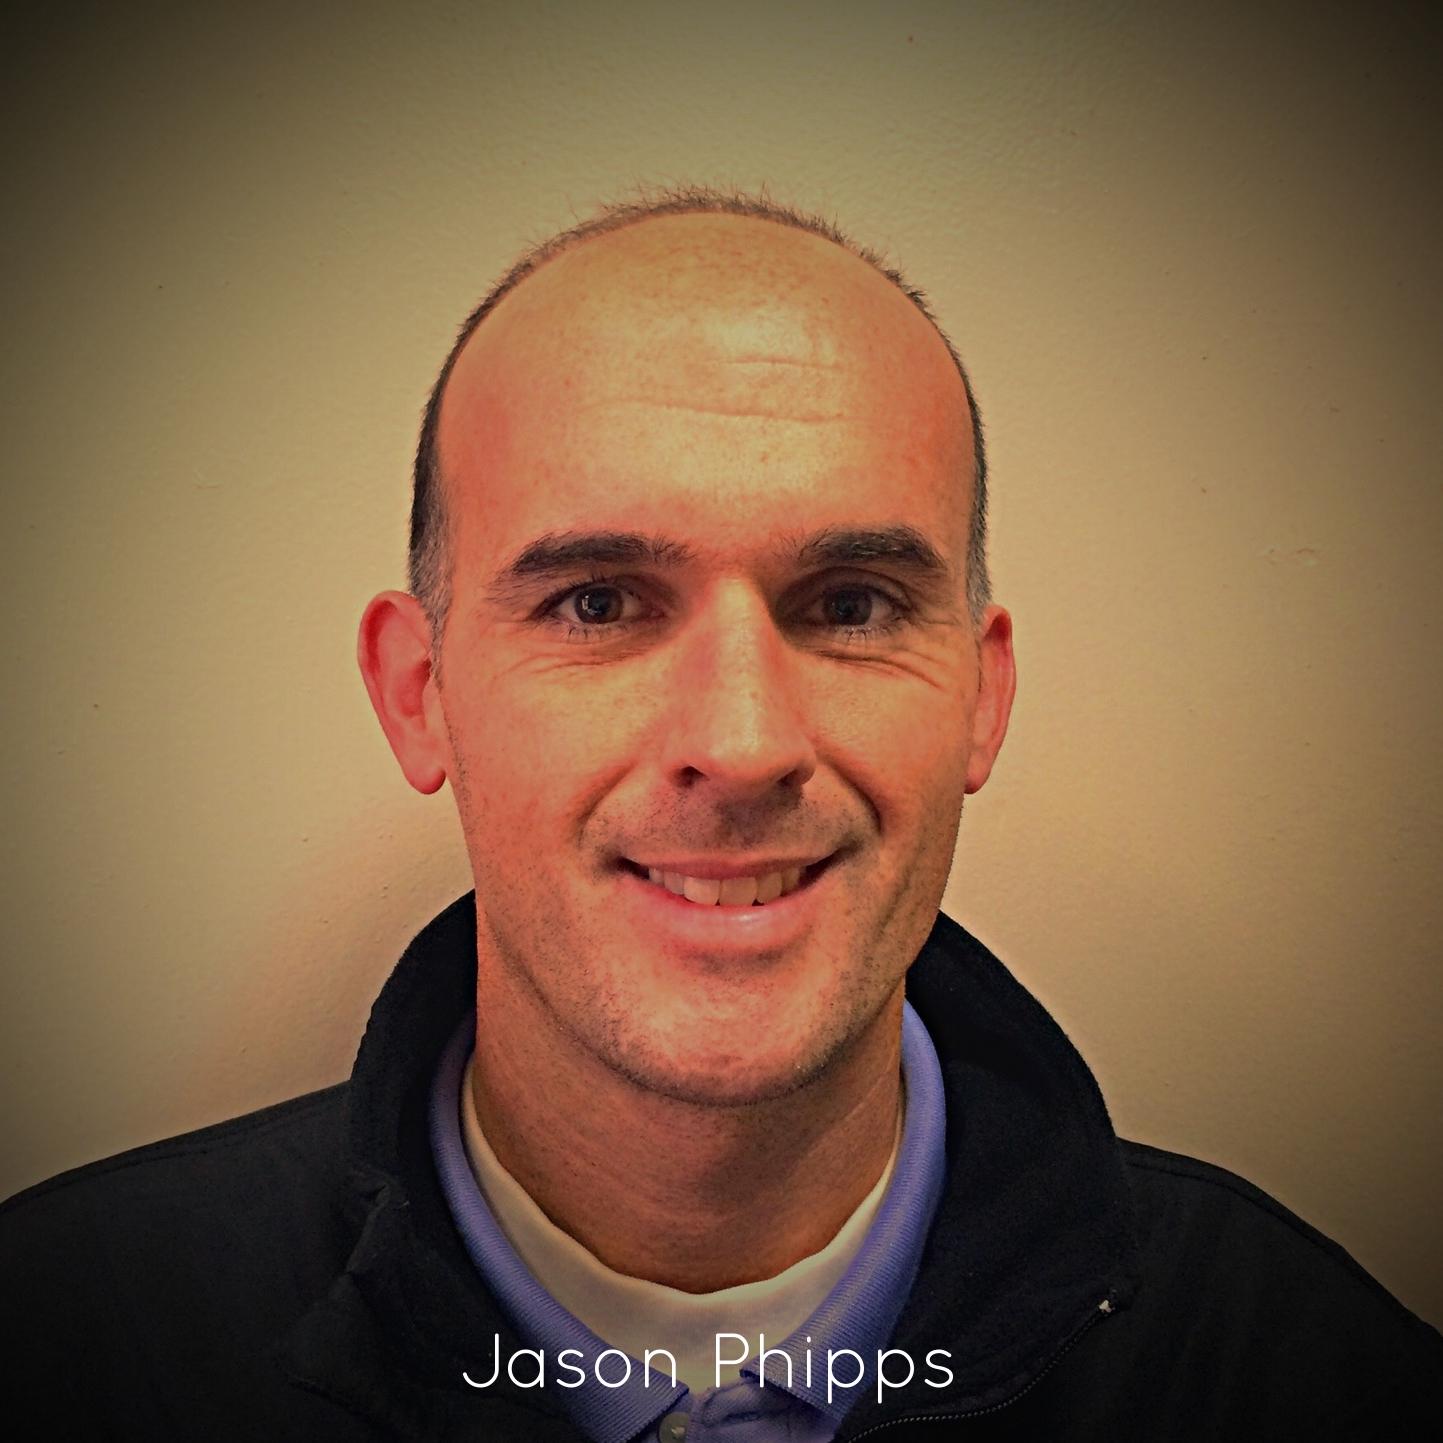 phipps_jason_headshot-15.JPG